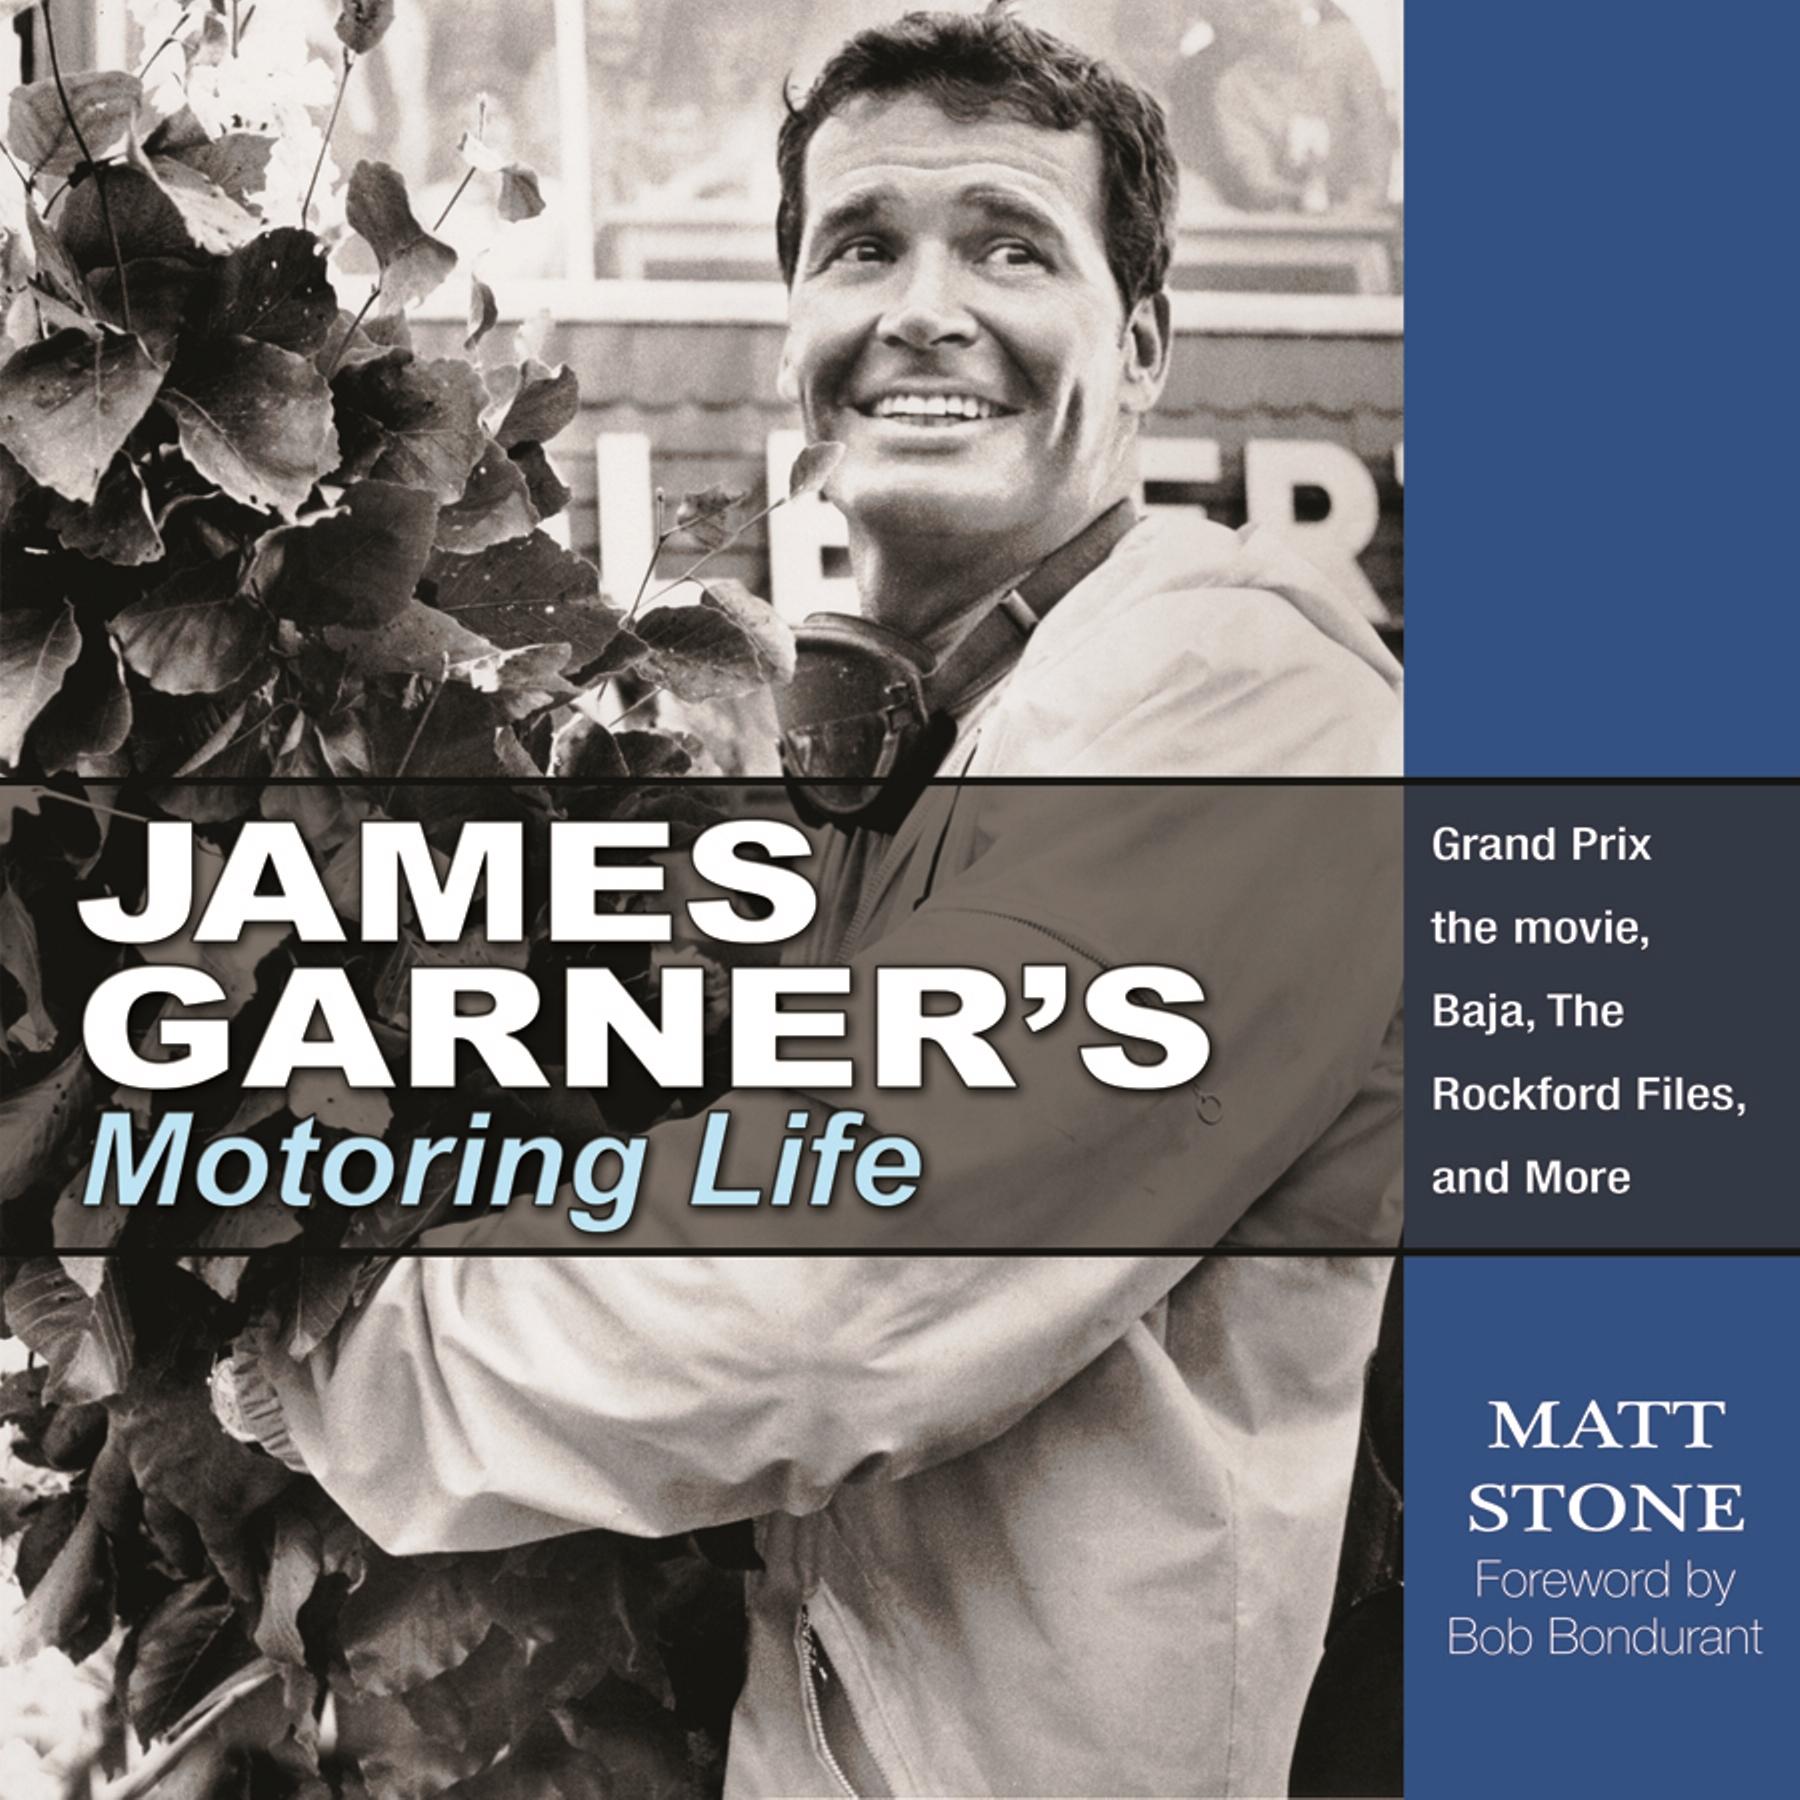 Coming Soon, My New Book; James Garner's Motoring Life